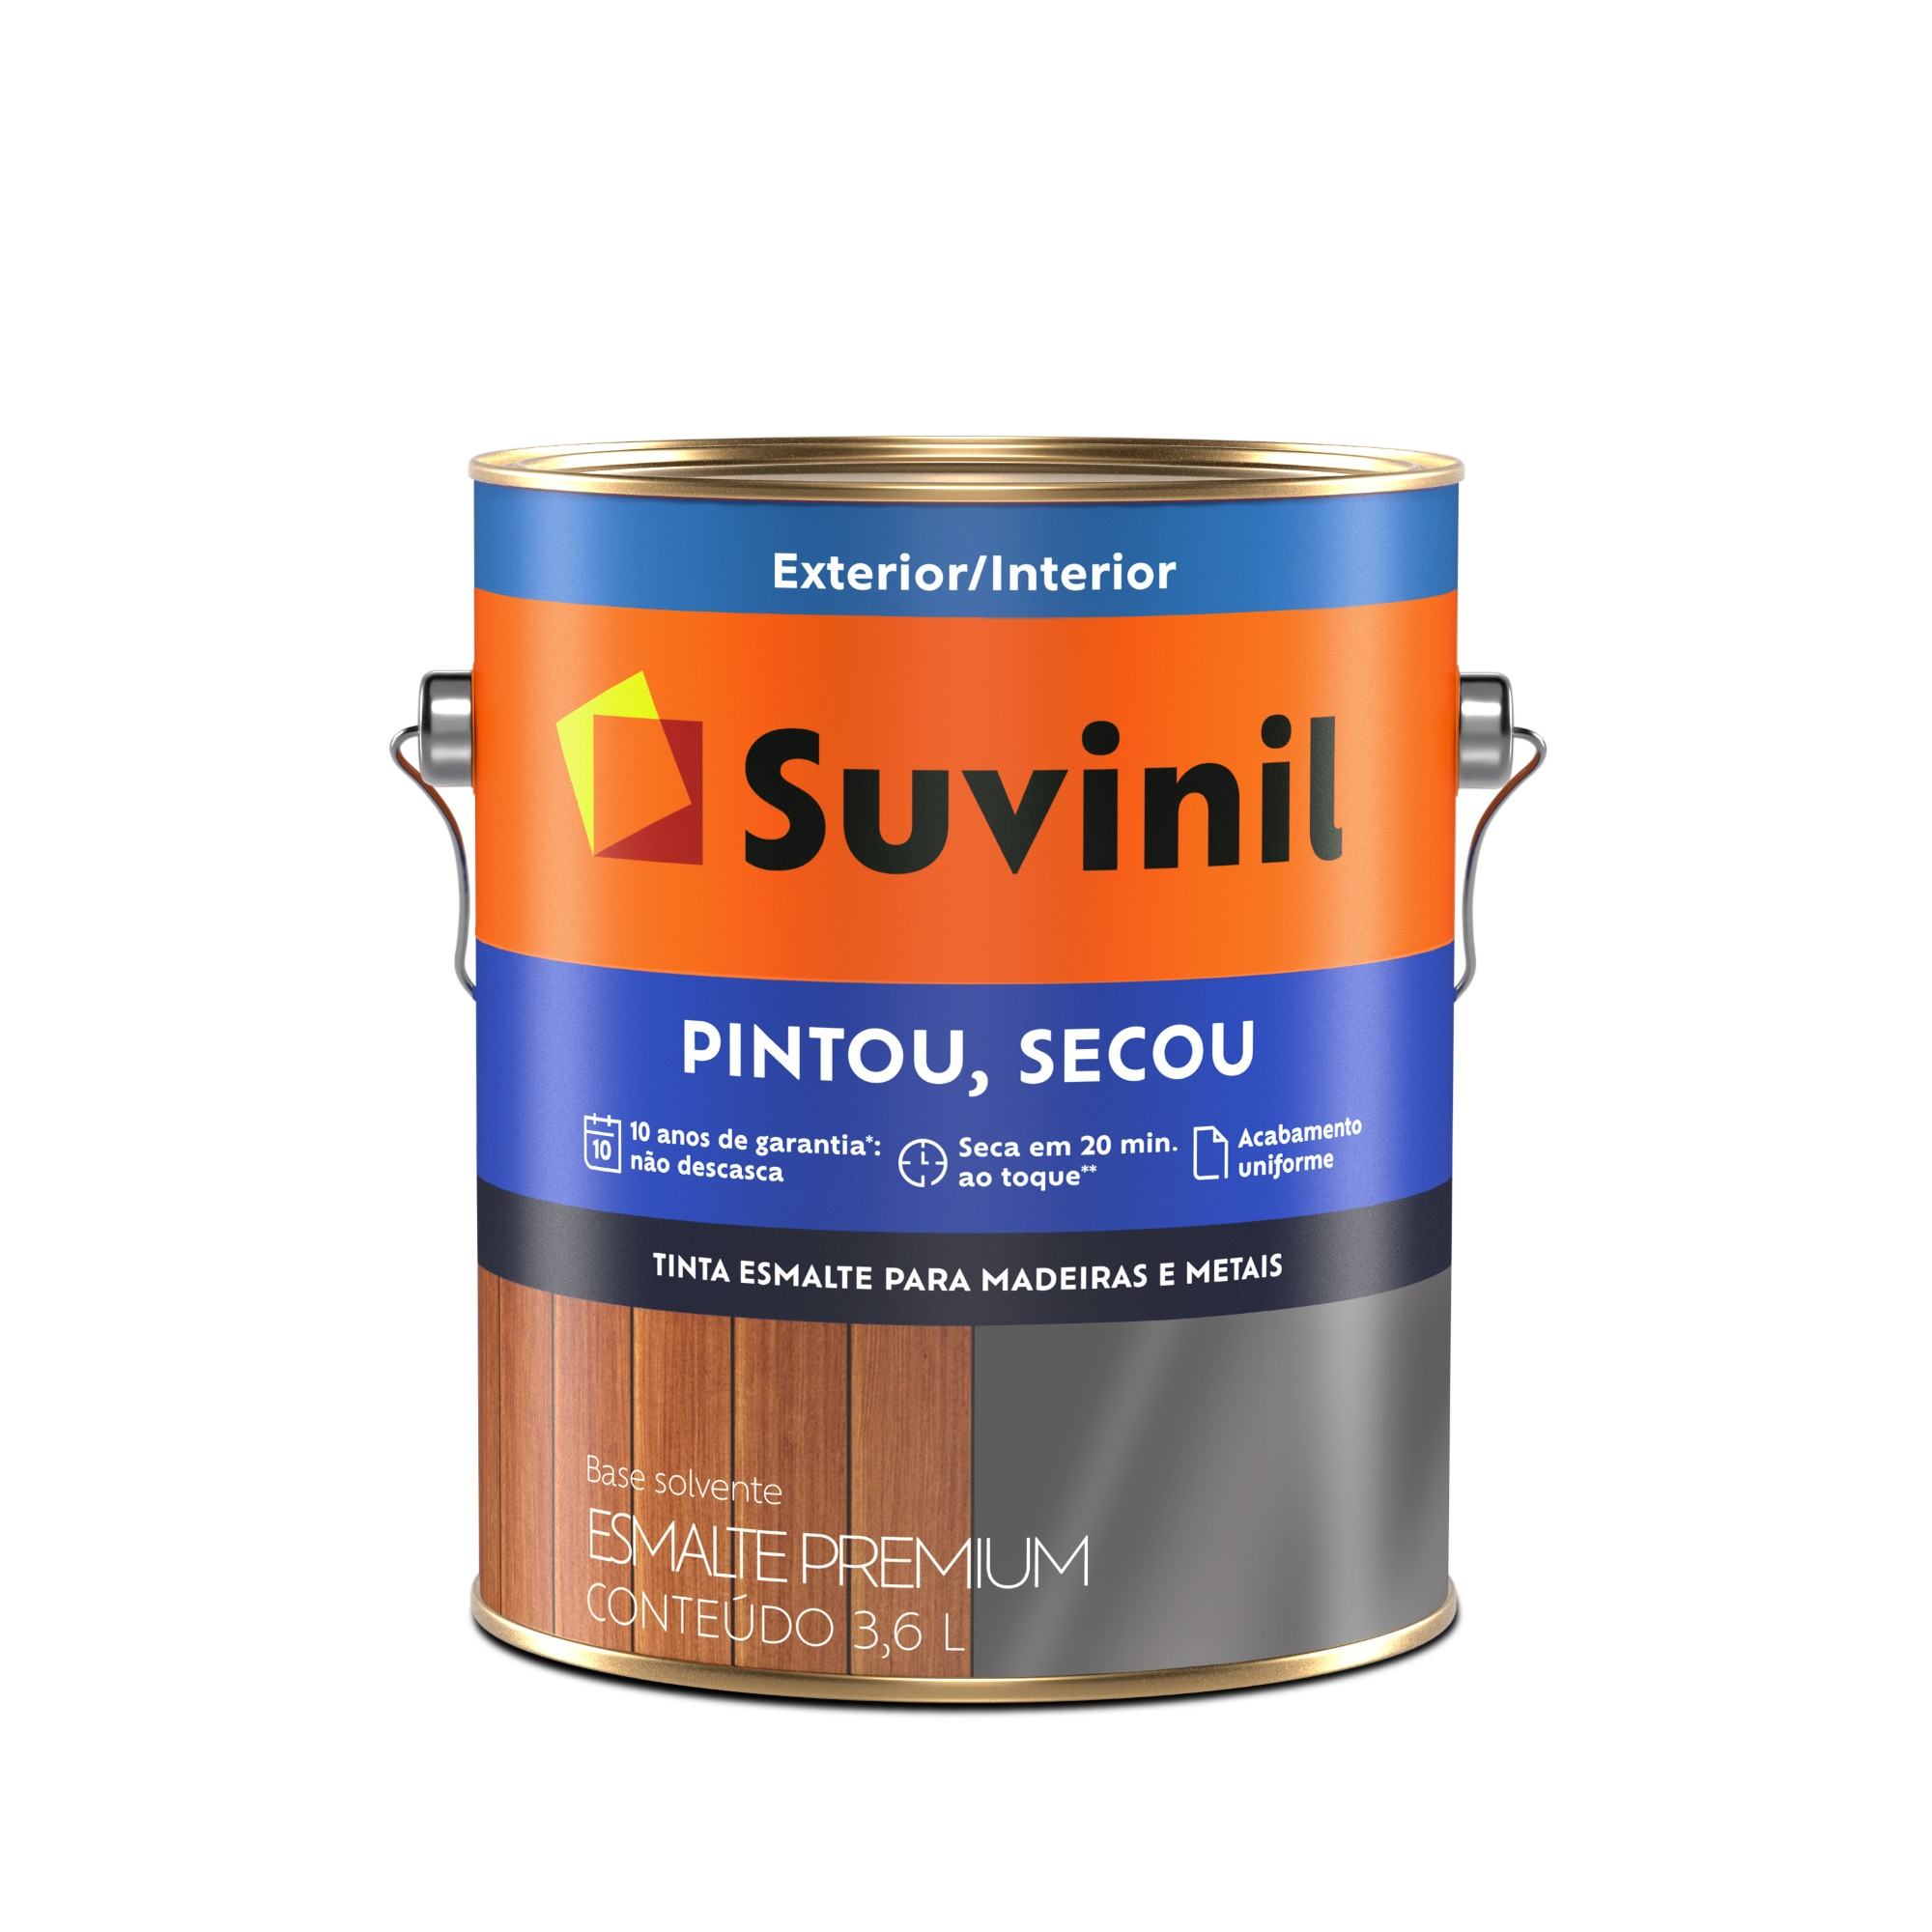 Tinta Esmalte Sintetico Brilhante Premium 36L - Amarelo - Ouro - Pintou Secou Suvinil